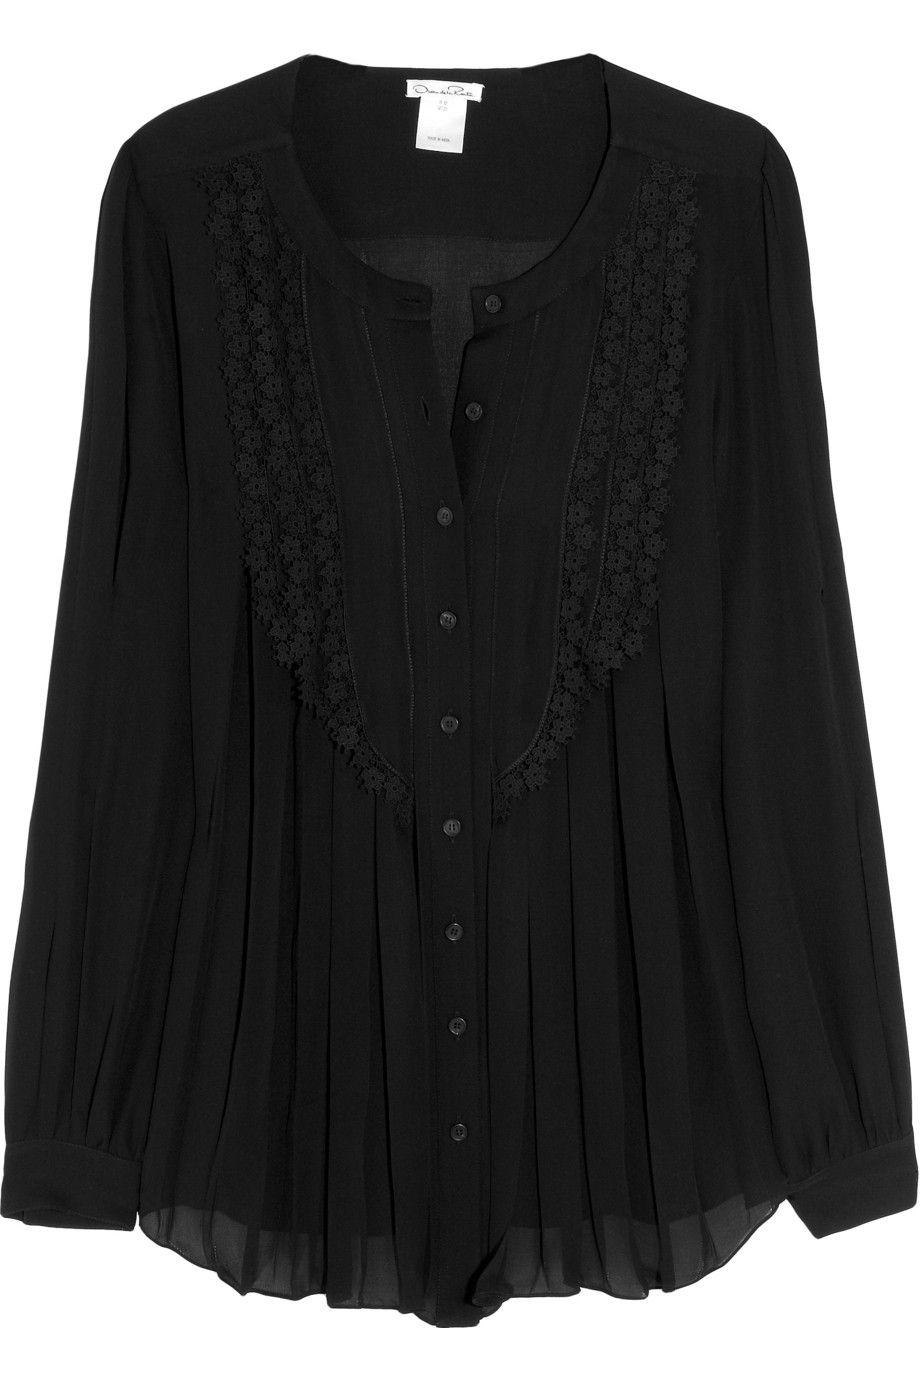 c14f0dbad1209c OSCAR DE LA RENTA Lace-trimmed silk-chiffon blouse BEAUTIFUL ...